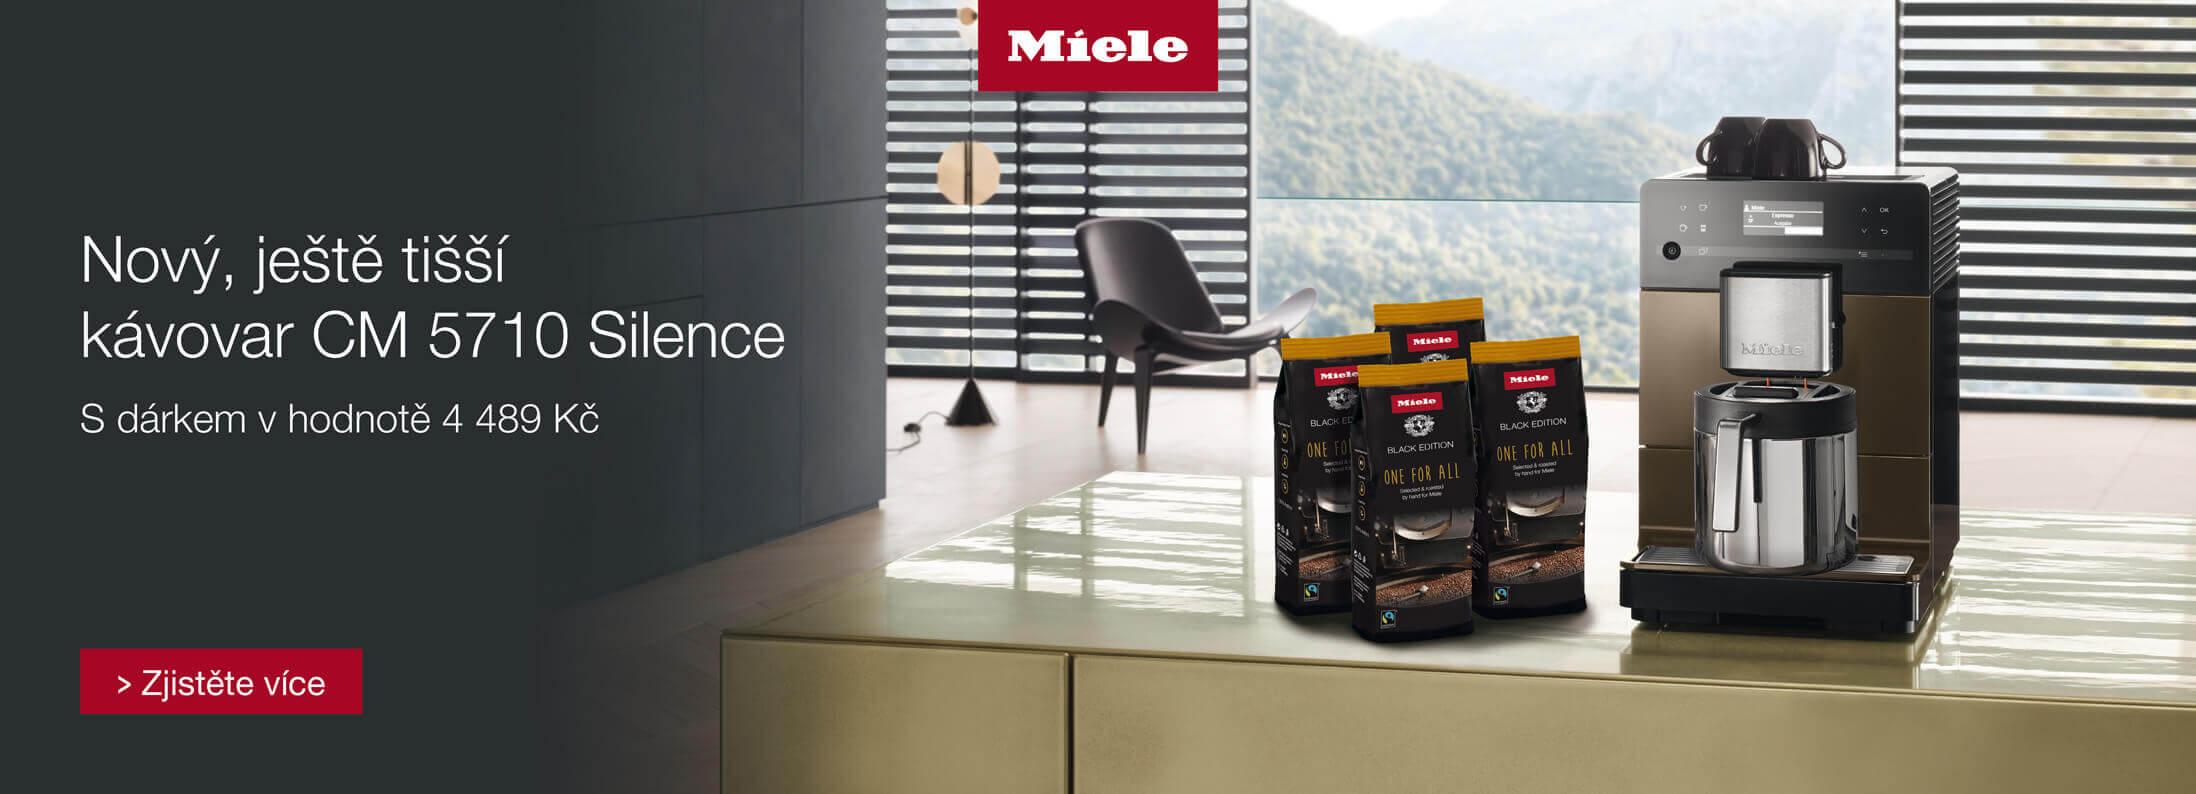 Miele - Dárek ke kávovaru Miele CM 5710 Silence